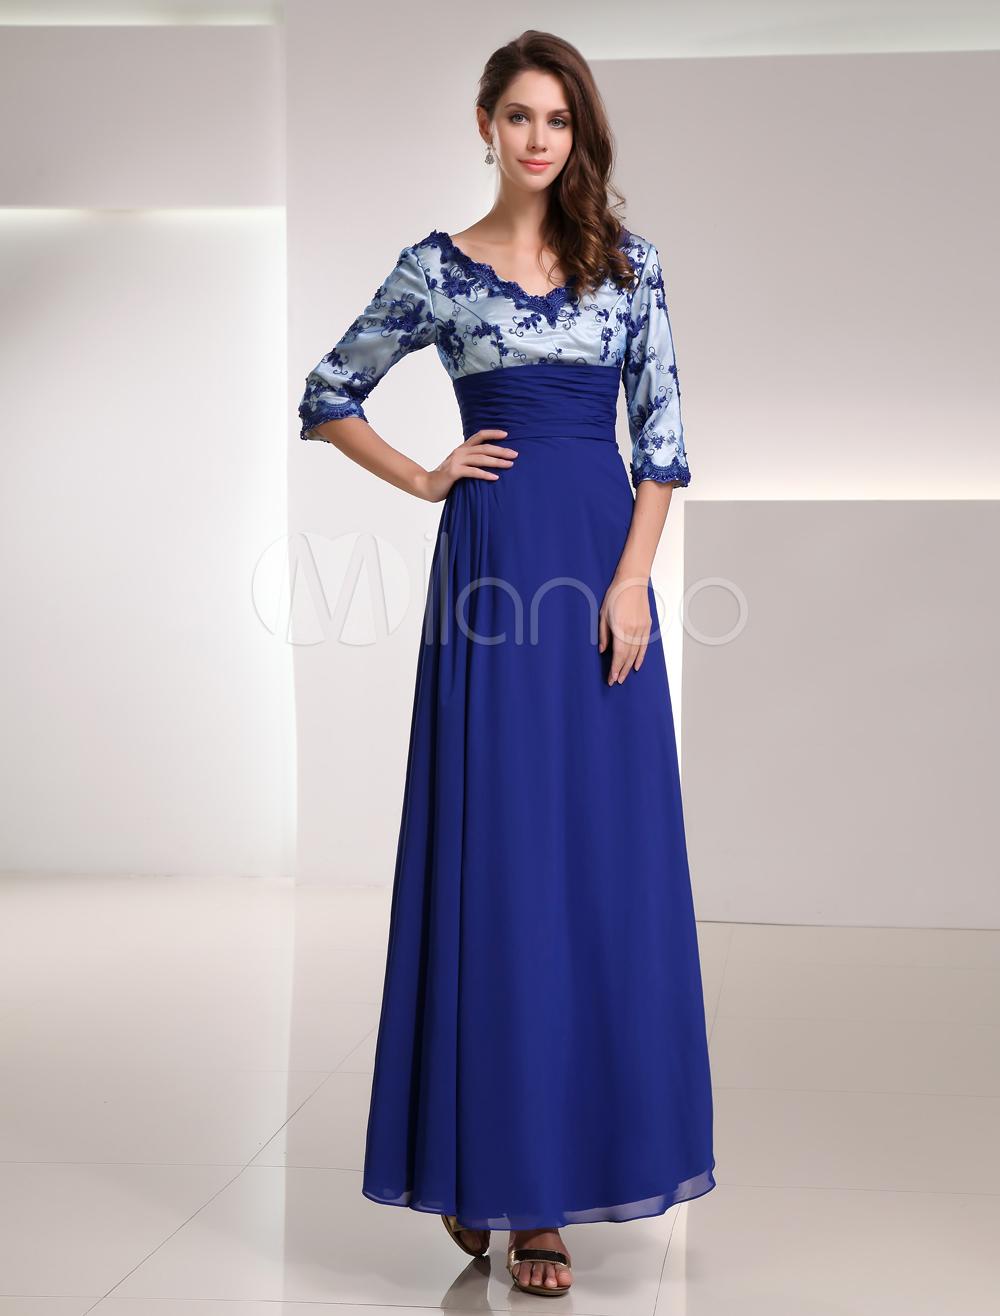 Royal Blue Chiffon Lace V-neck Half Sleeve Mother of the Bride Dress